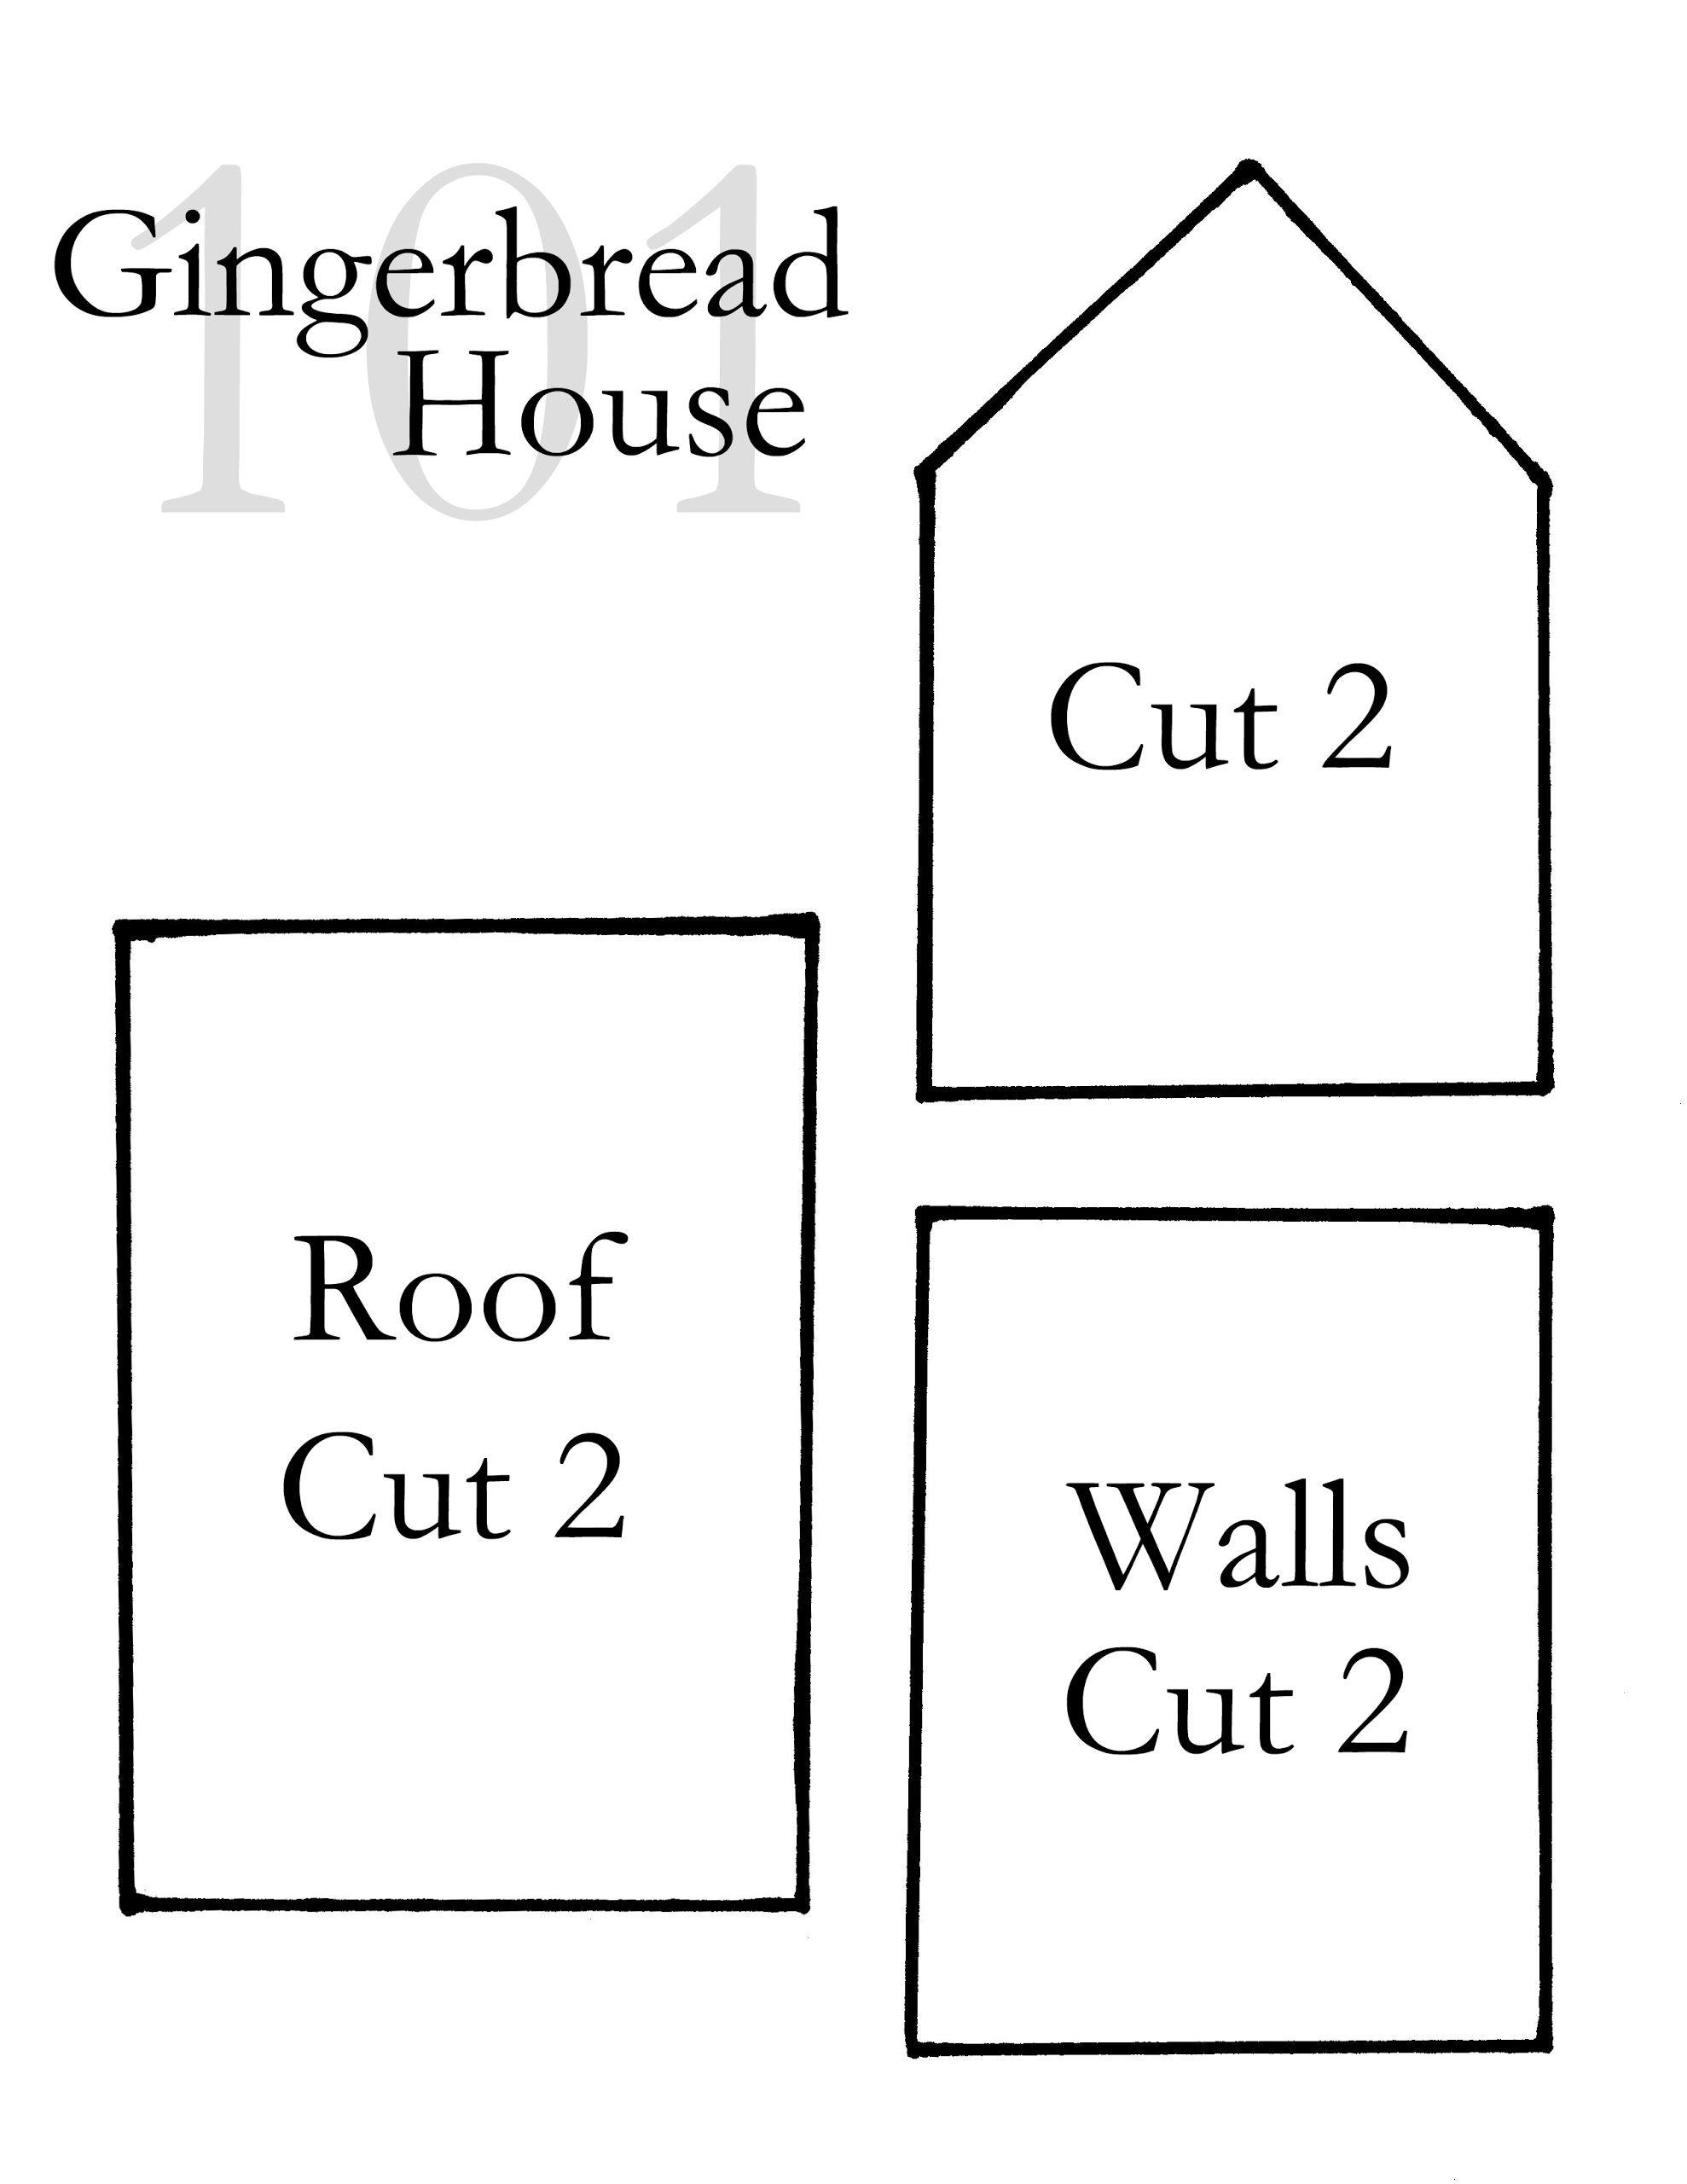 Gingerbread House Pattern Jpg Google Drive Casas De Pan De Jengibre Comidas Navidenas Casa De Jengibre